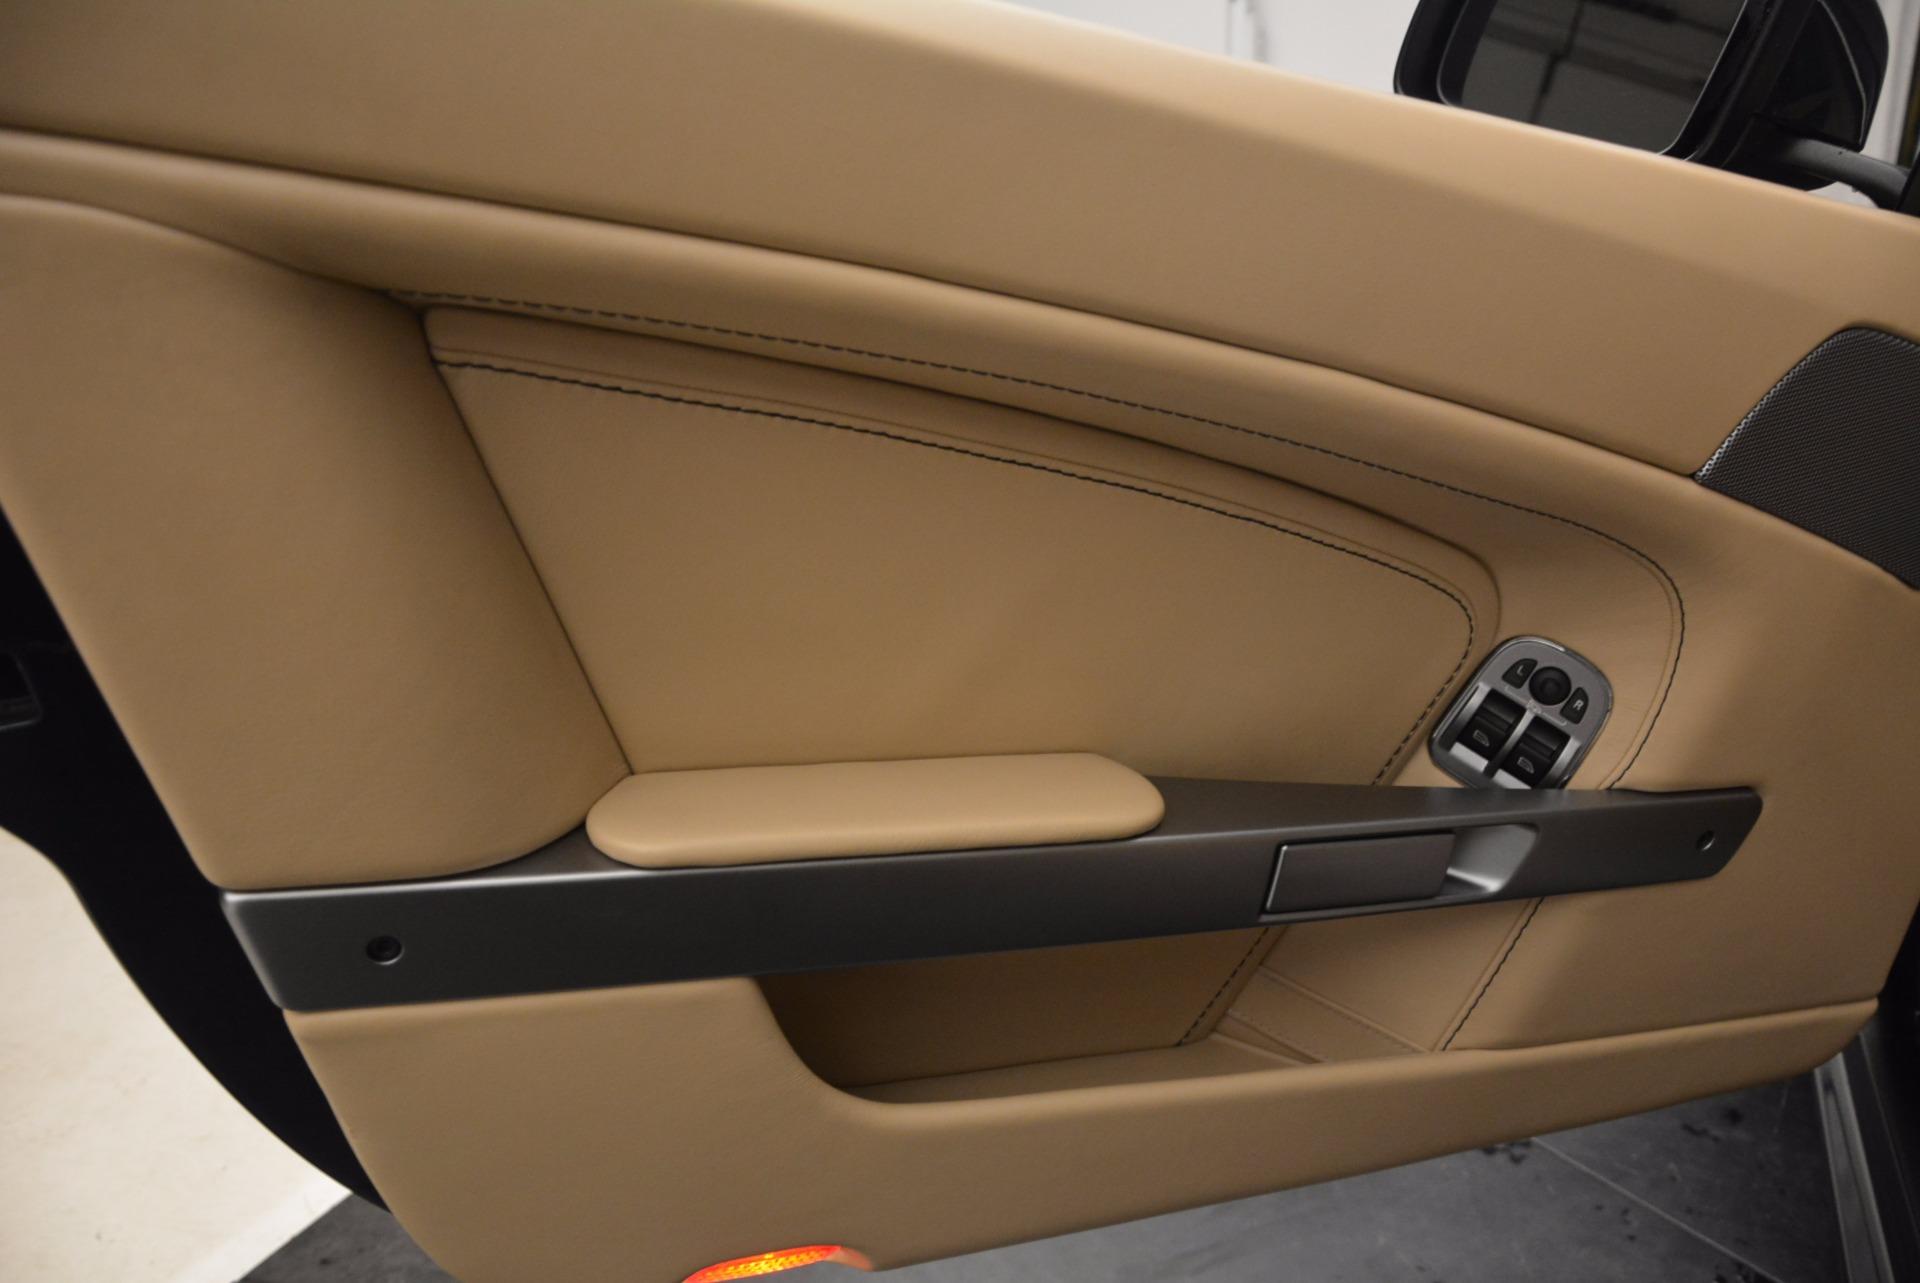 Used 2014 Aston Martin V8 Vantage Roadster For Sale In Westport, CT 1623_p22